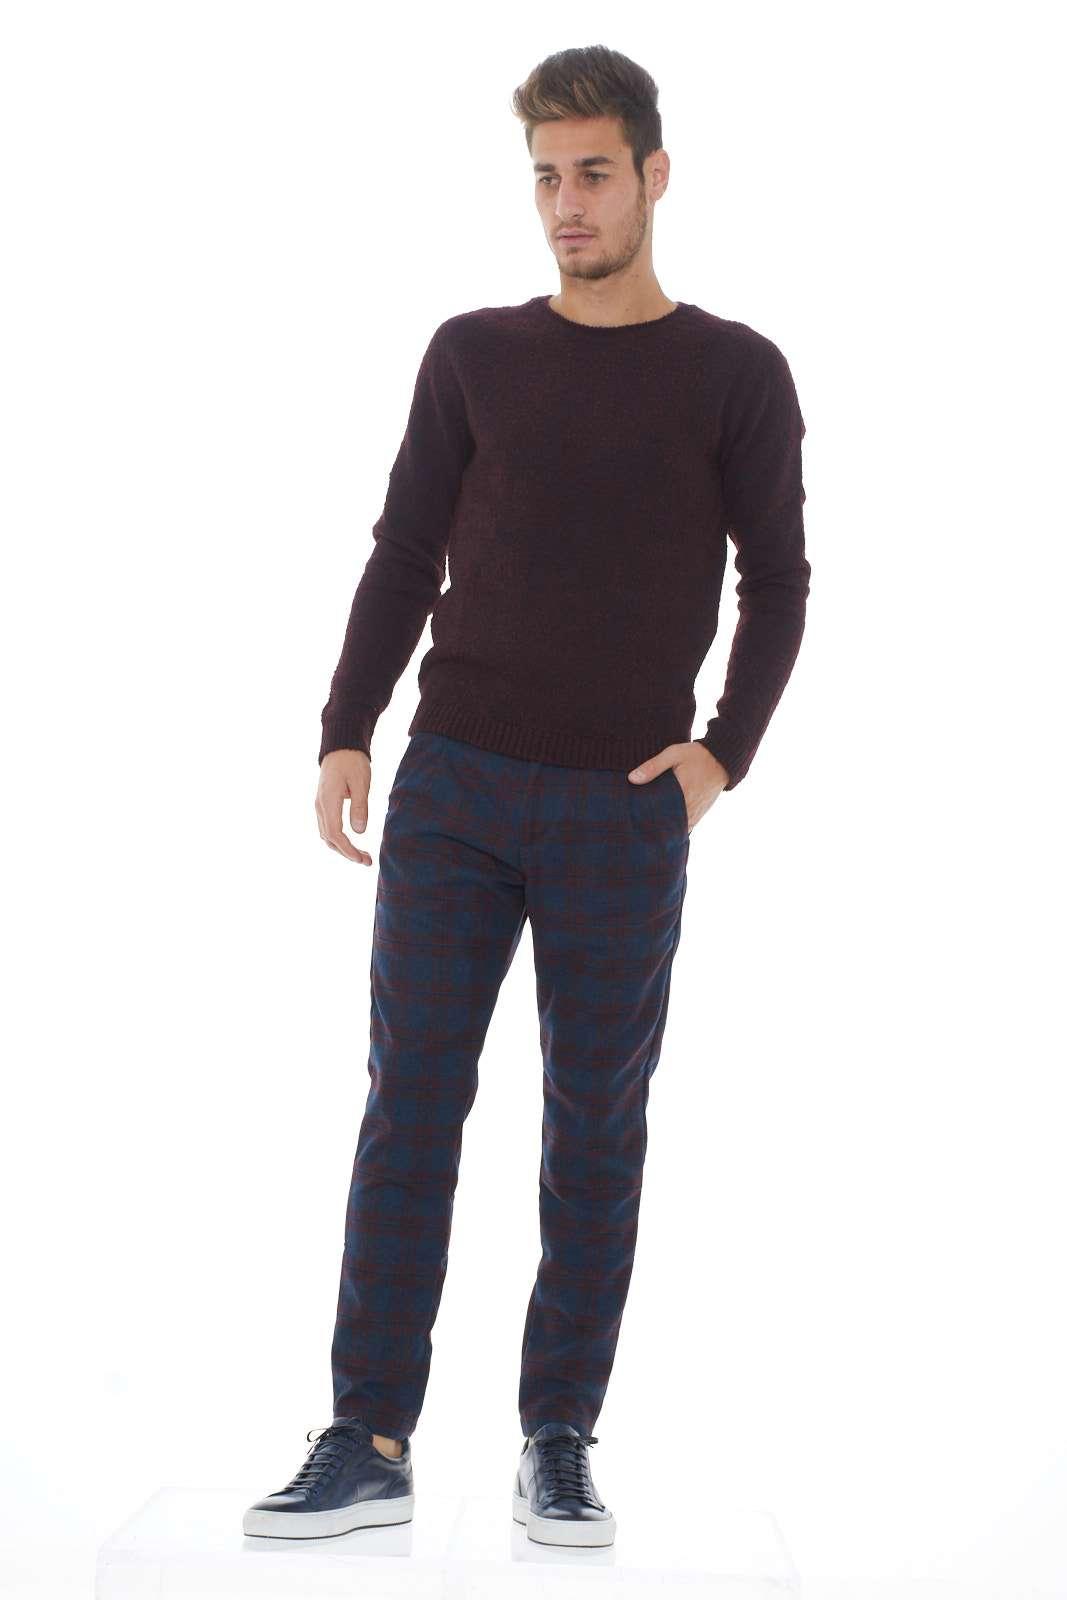 https://www.parmax.com/media/catalog/product/A/I/AI-outlet_parmax-pantaloni-uomo-Squad-ffc9804-D_1.jpg